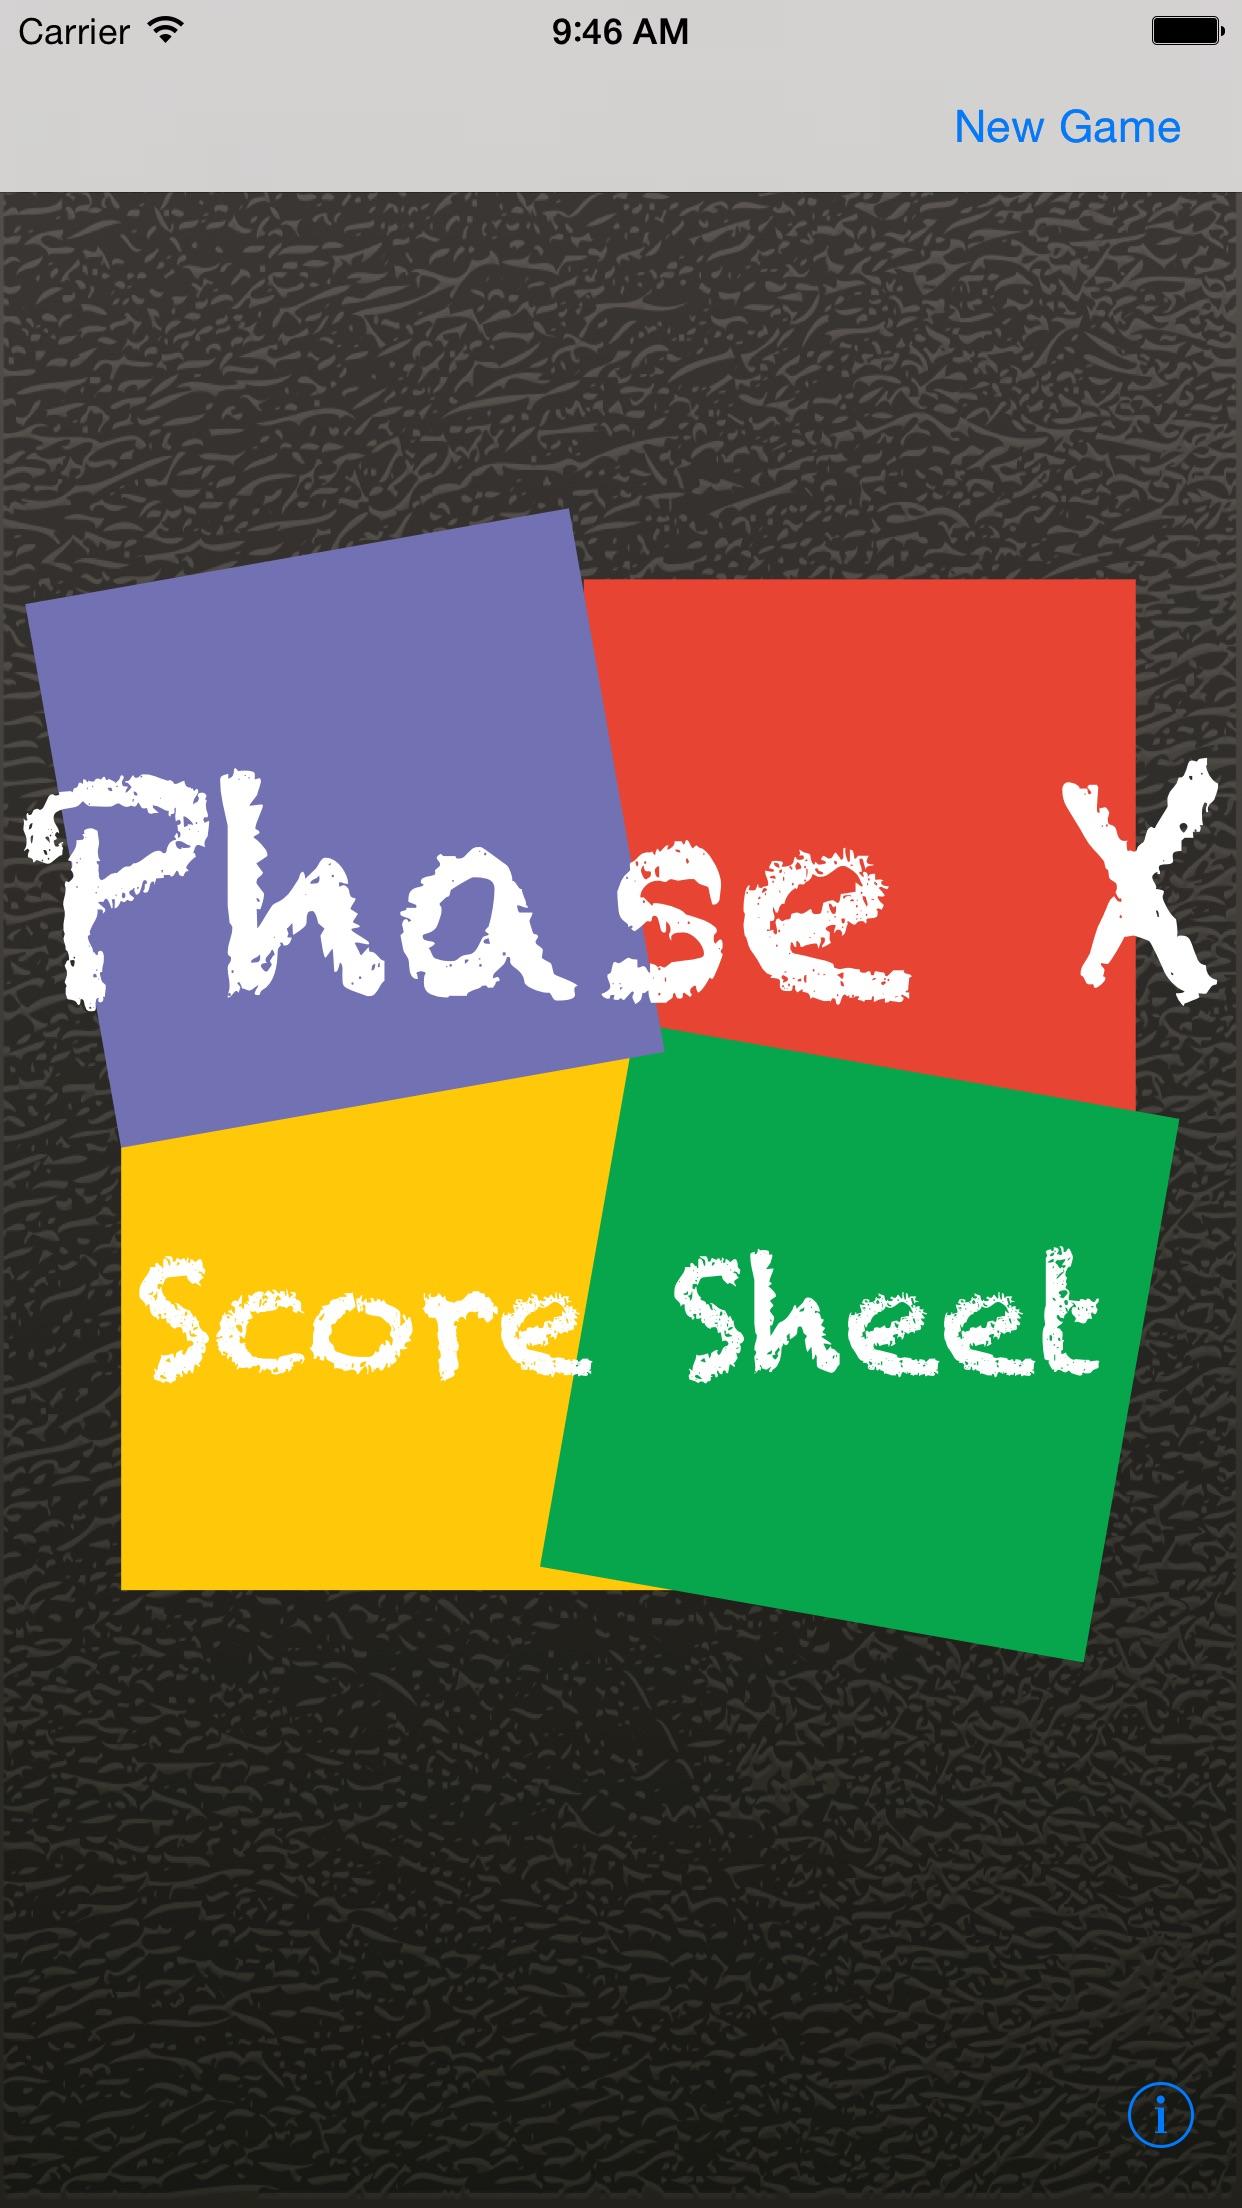 Phase 10 Score Sheet Screenshot